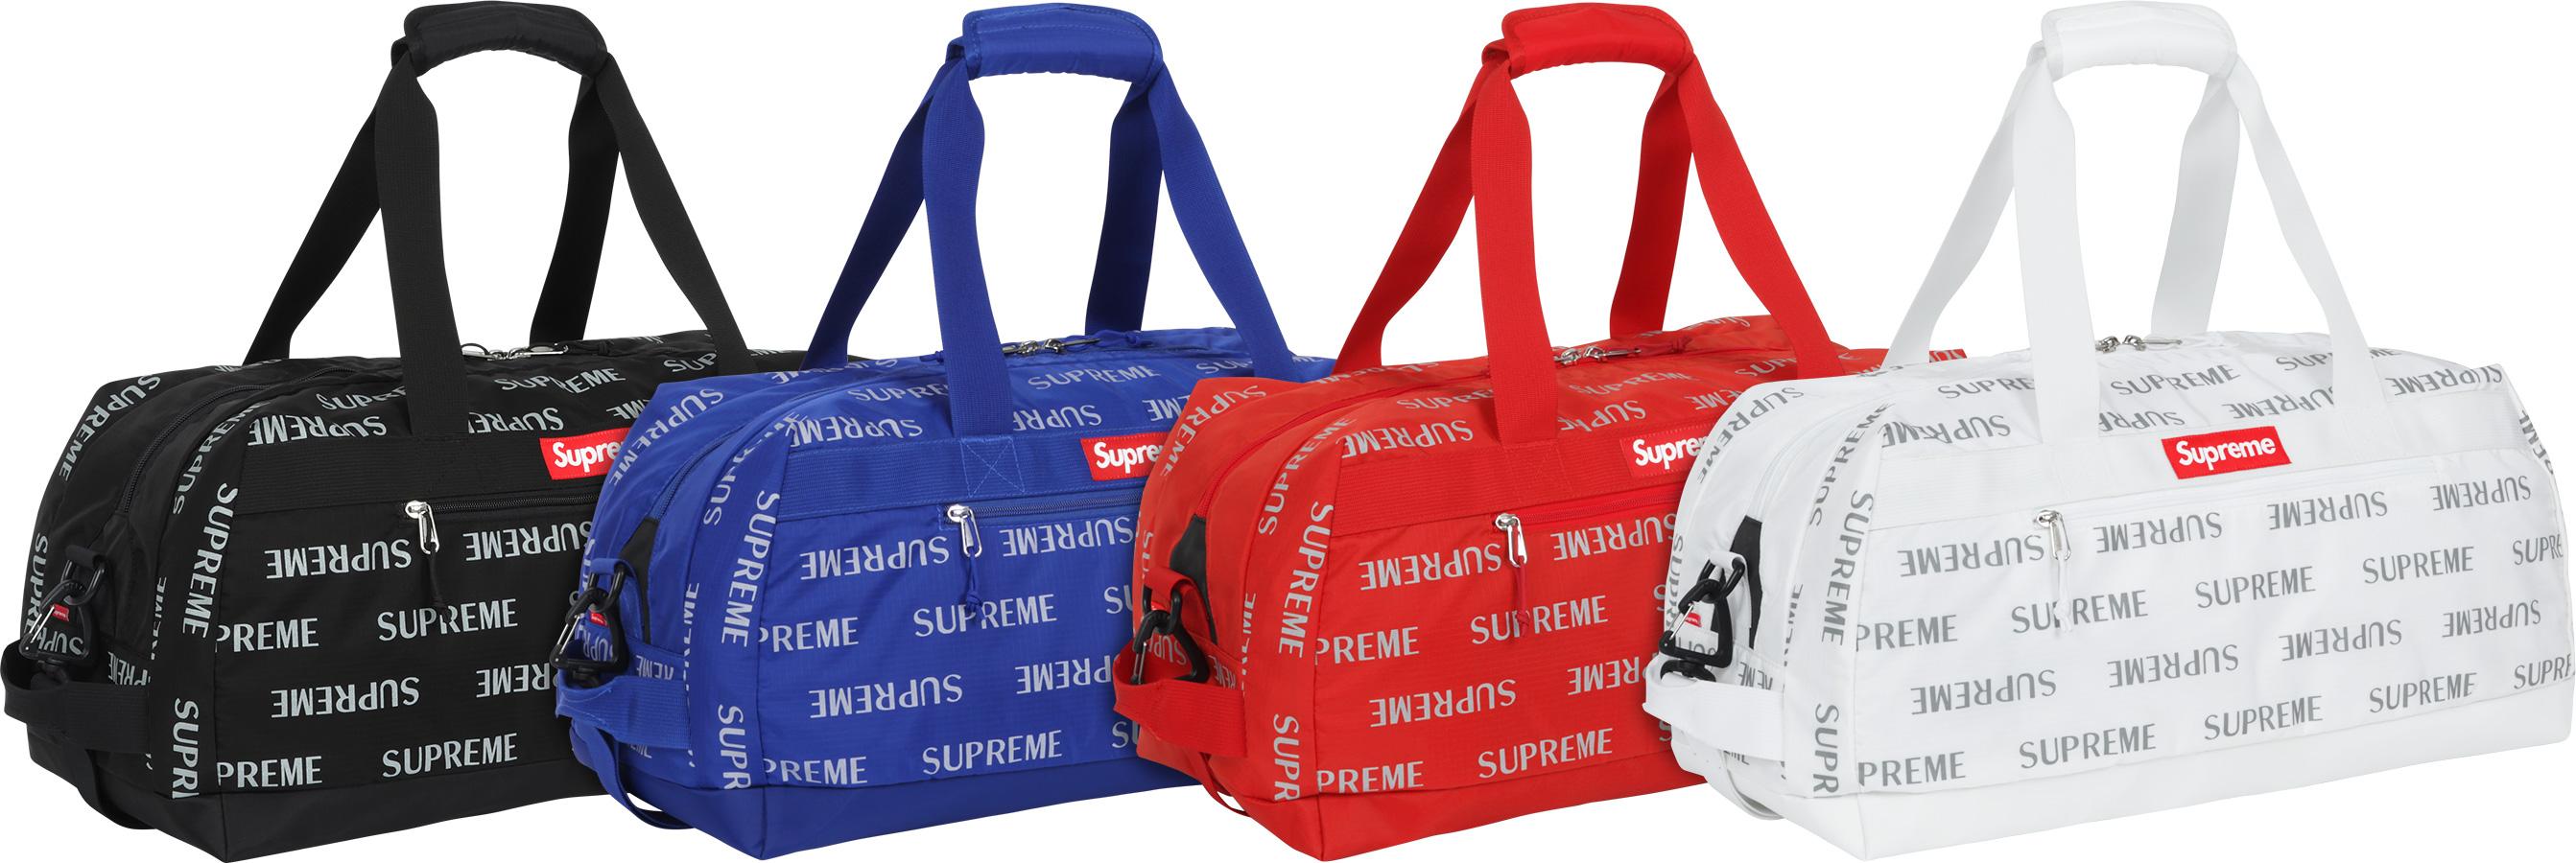 quality design 291a8 ed943 supreme duffle bag 3m